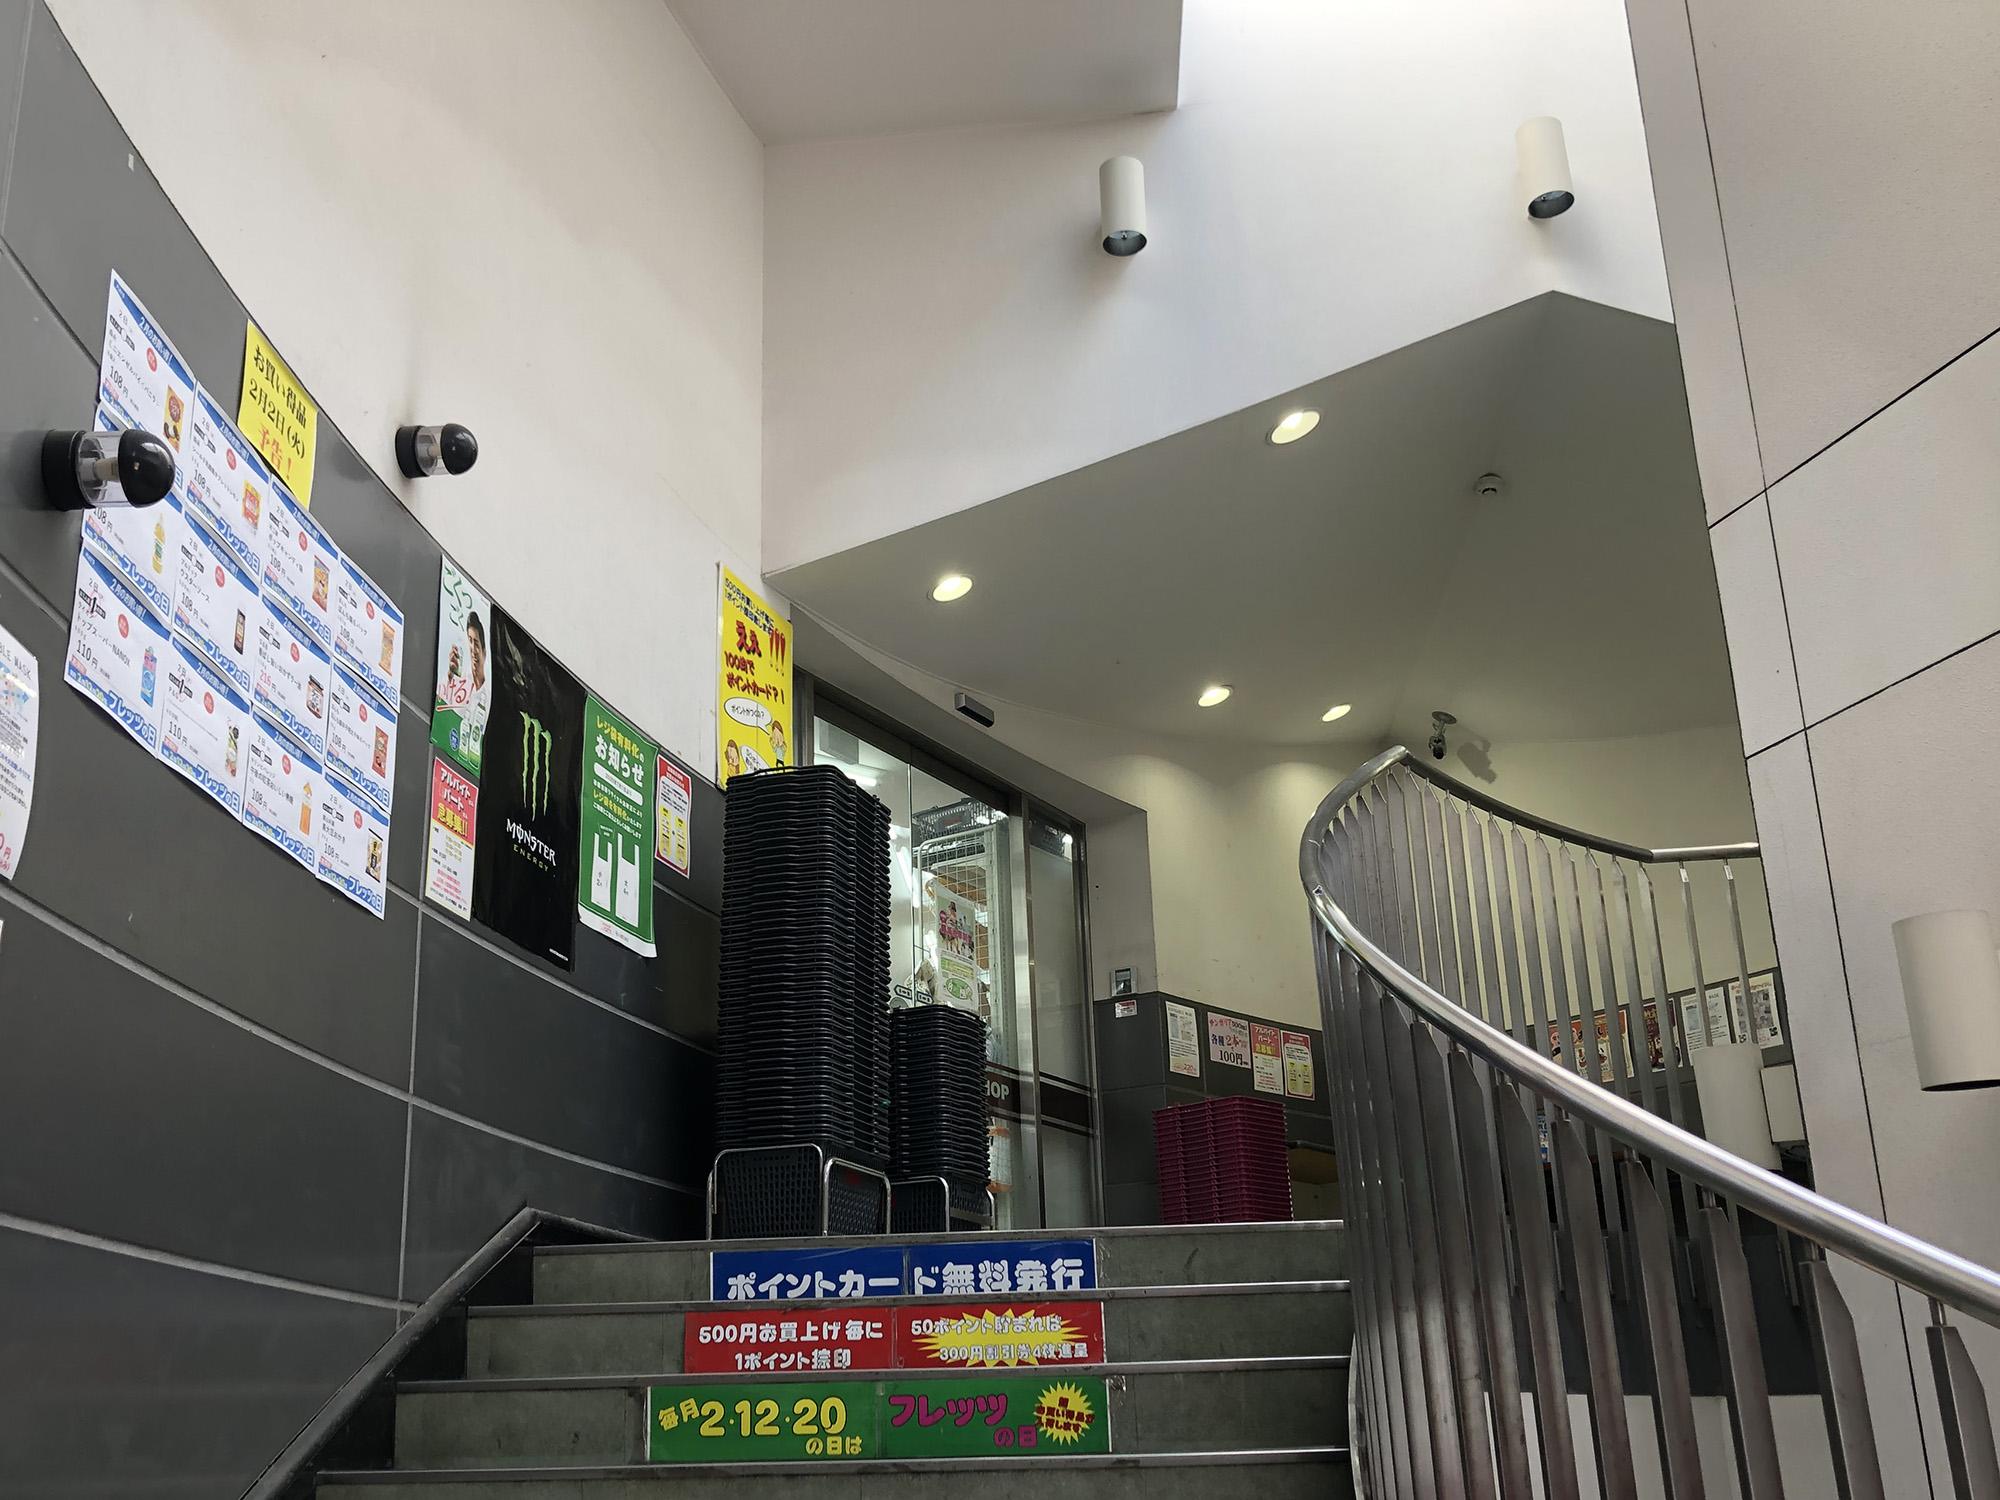 FLET'S 芦屋店